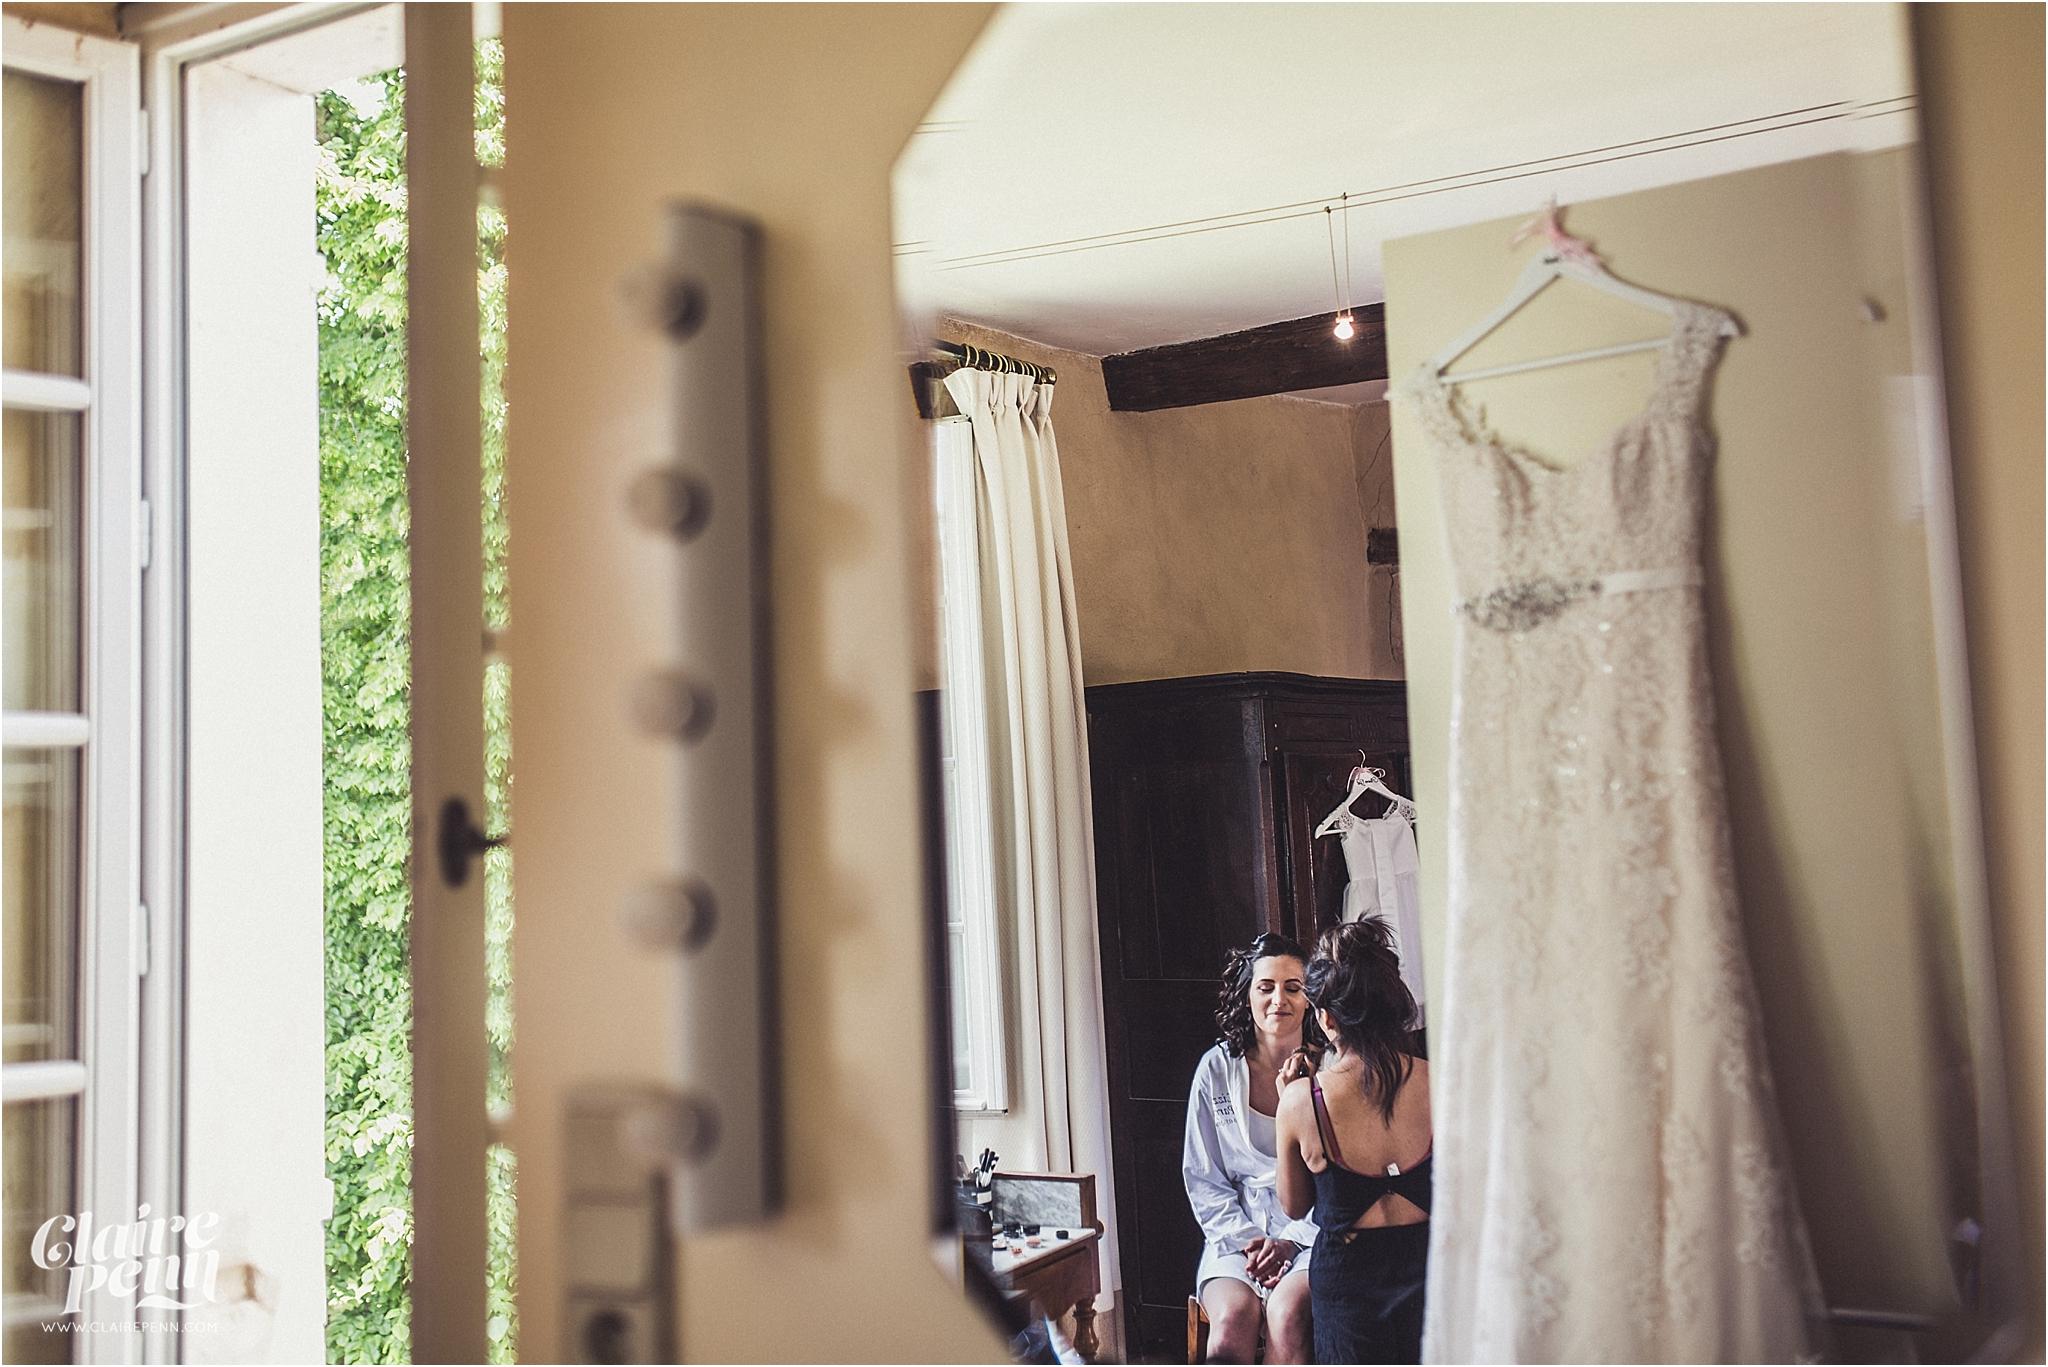 La Leotardie wedding Dordogne France_0010.jpg